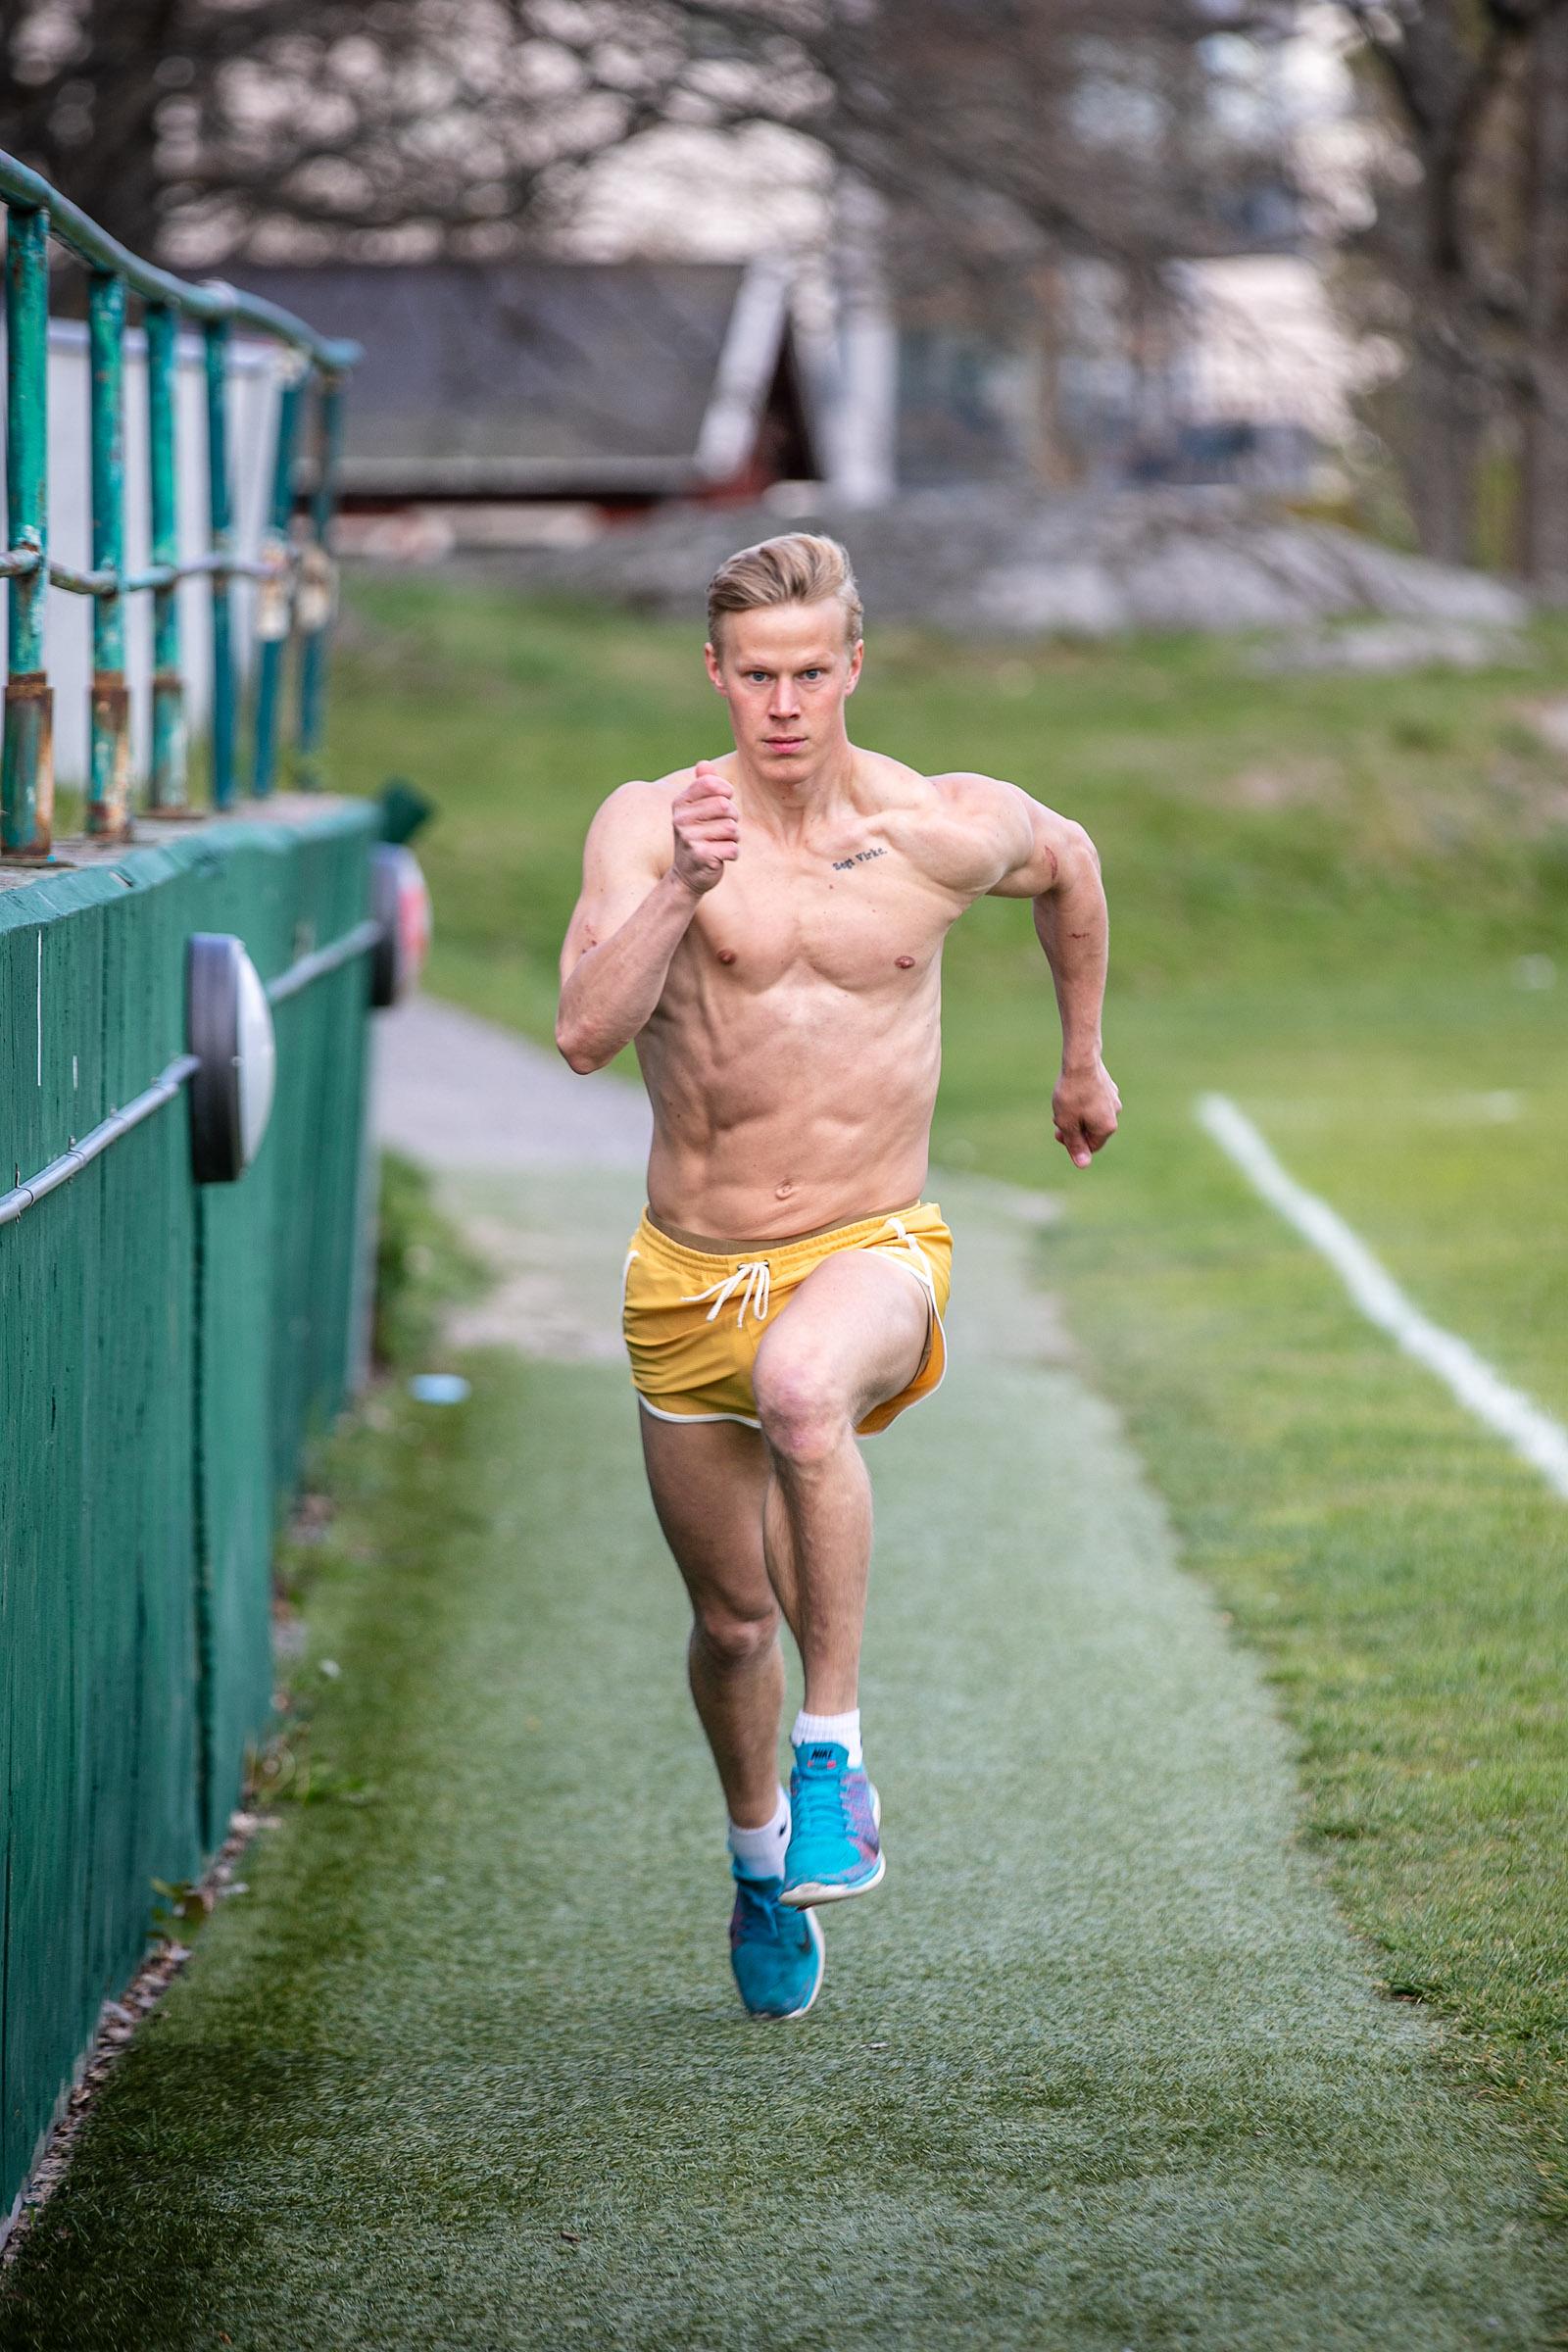 YMR_SEGT-VIRKE_Varmdo_Fitness02